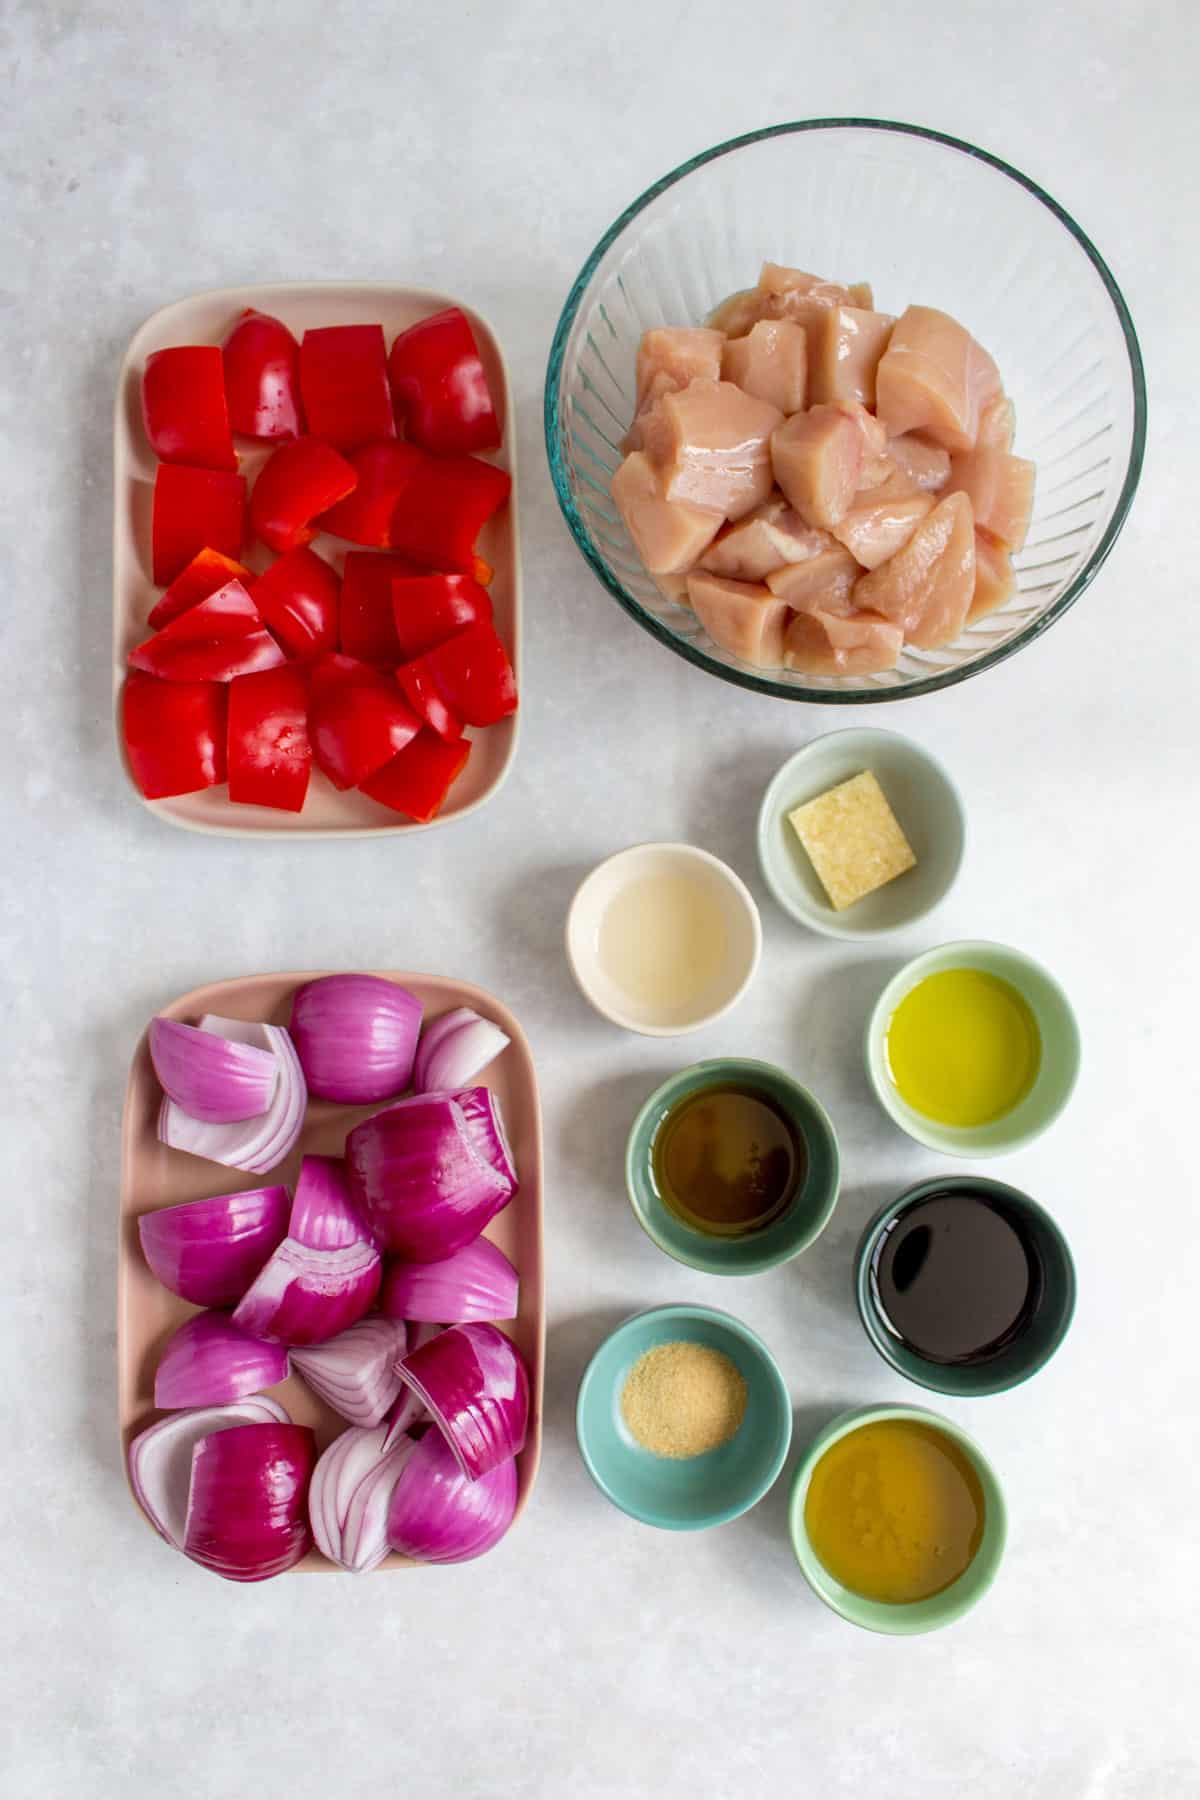 Ingredients needed to make chicken kabobs.